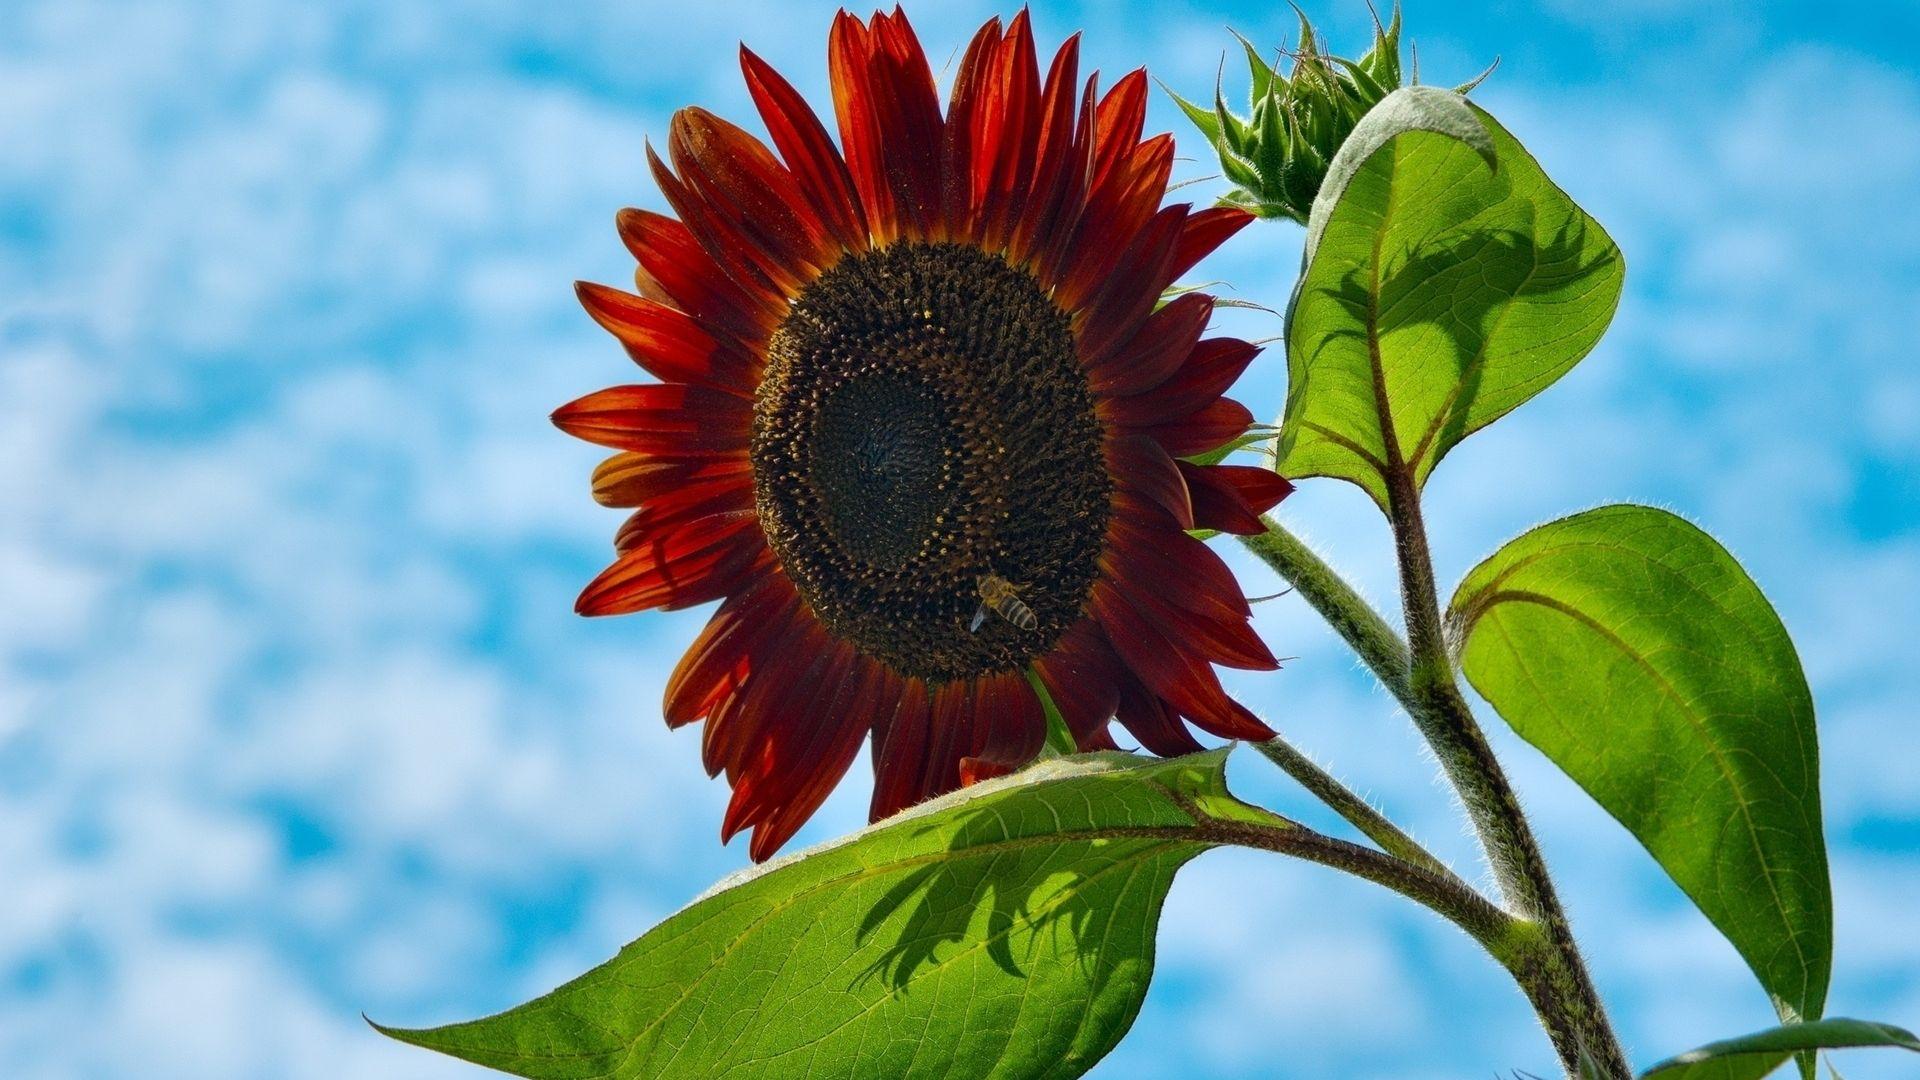 Desktop Wallpaper Red Sunflower Hd Image Picture Background Xxvews